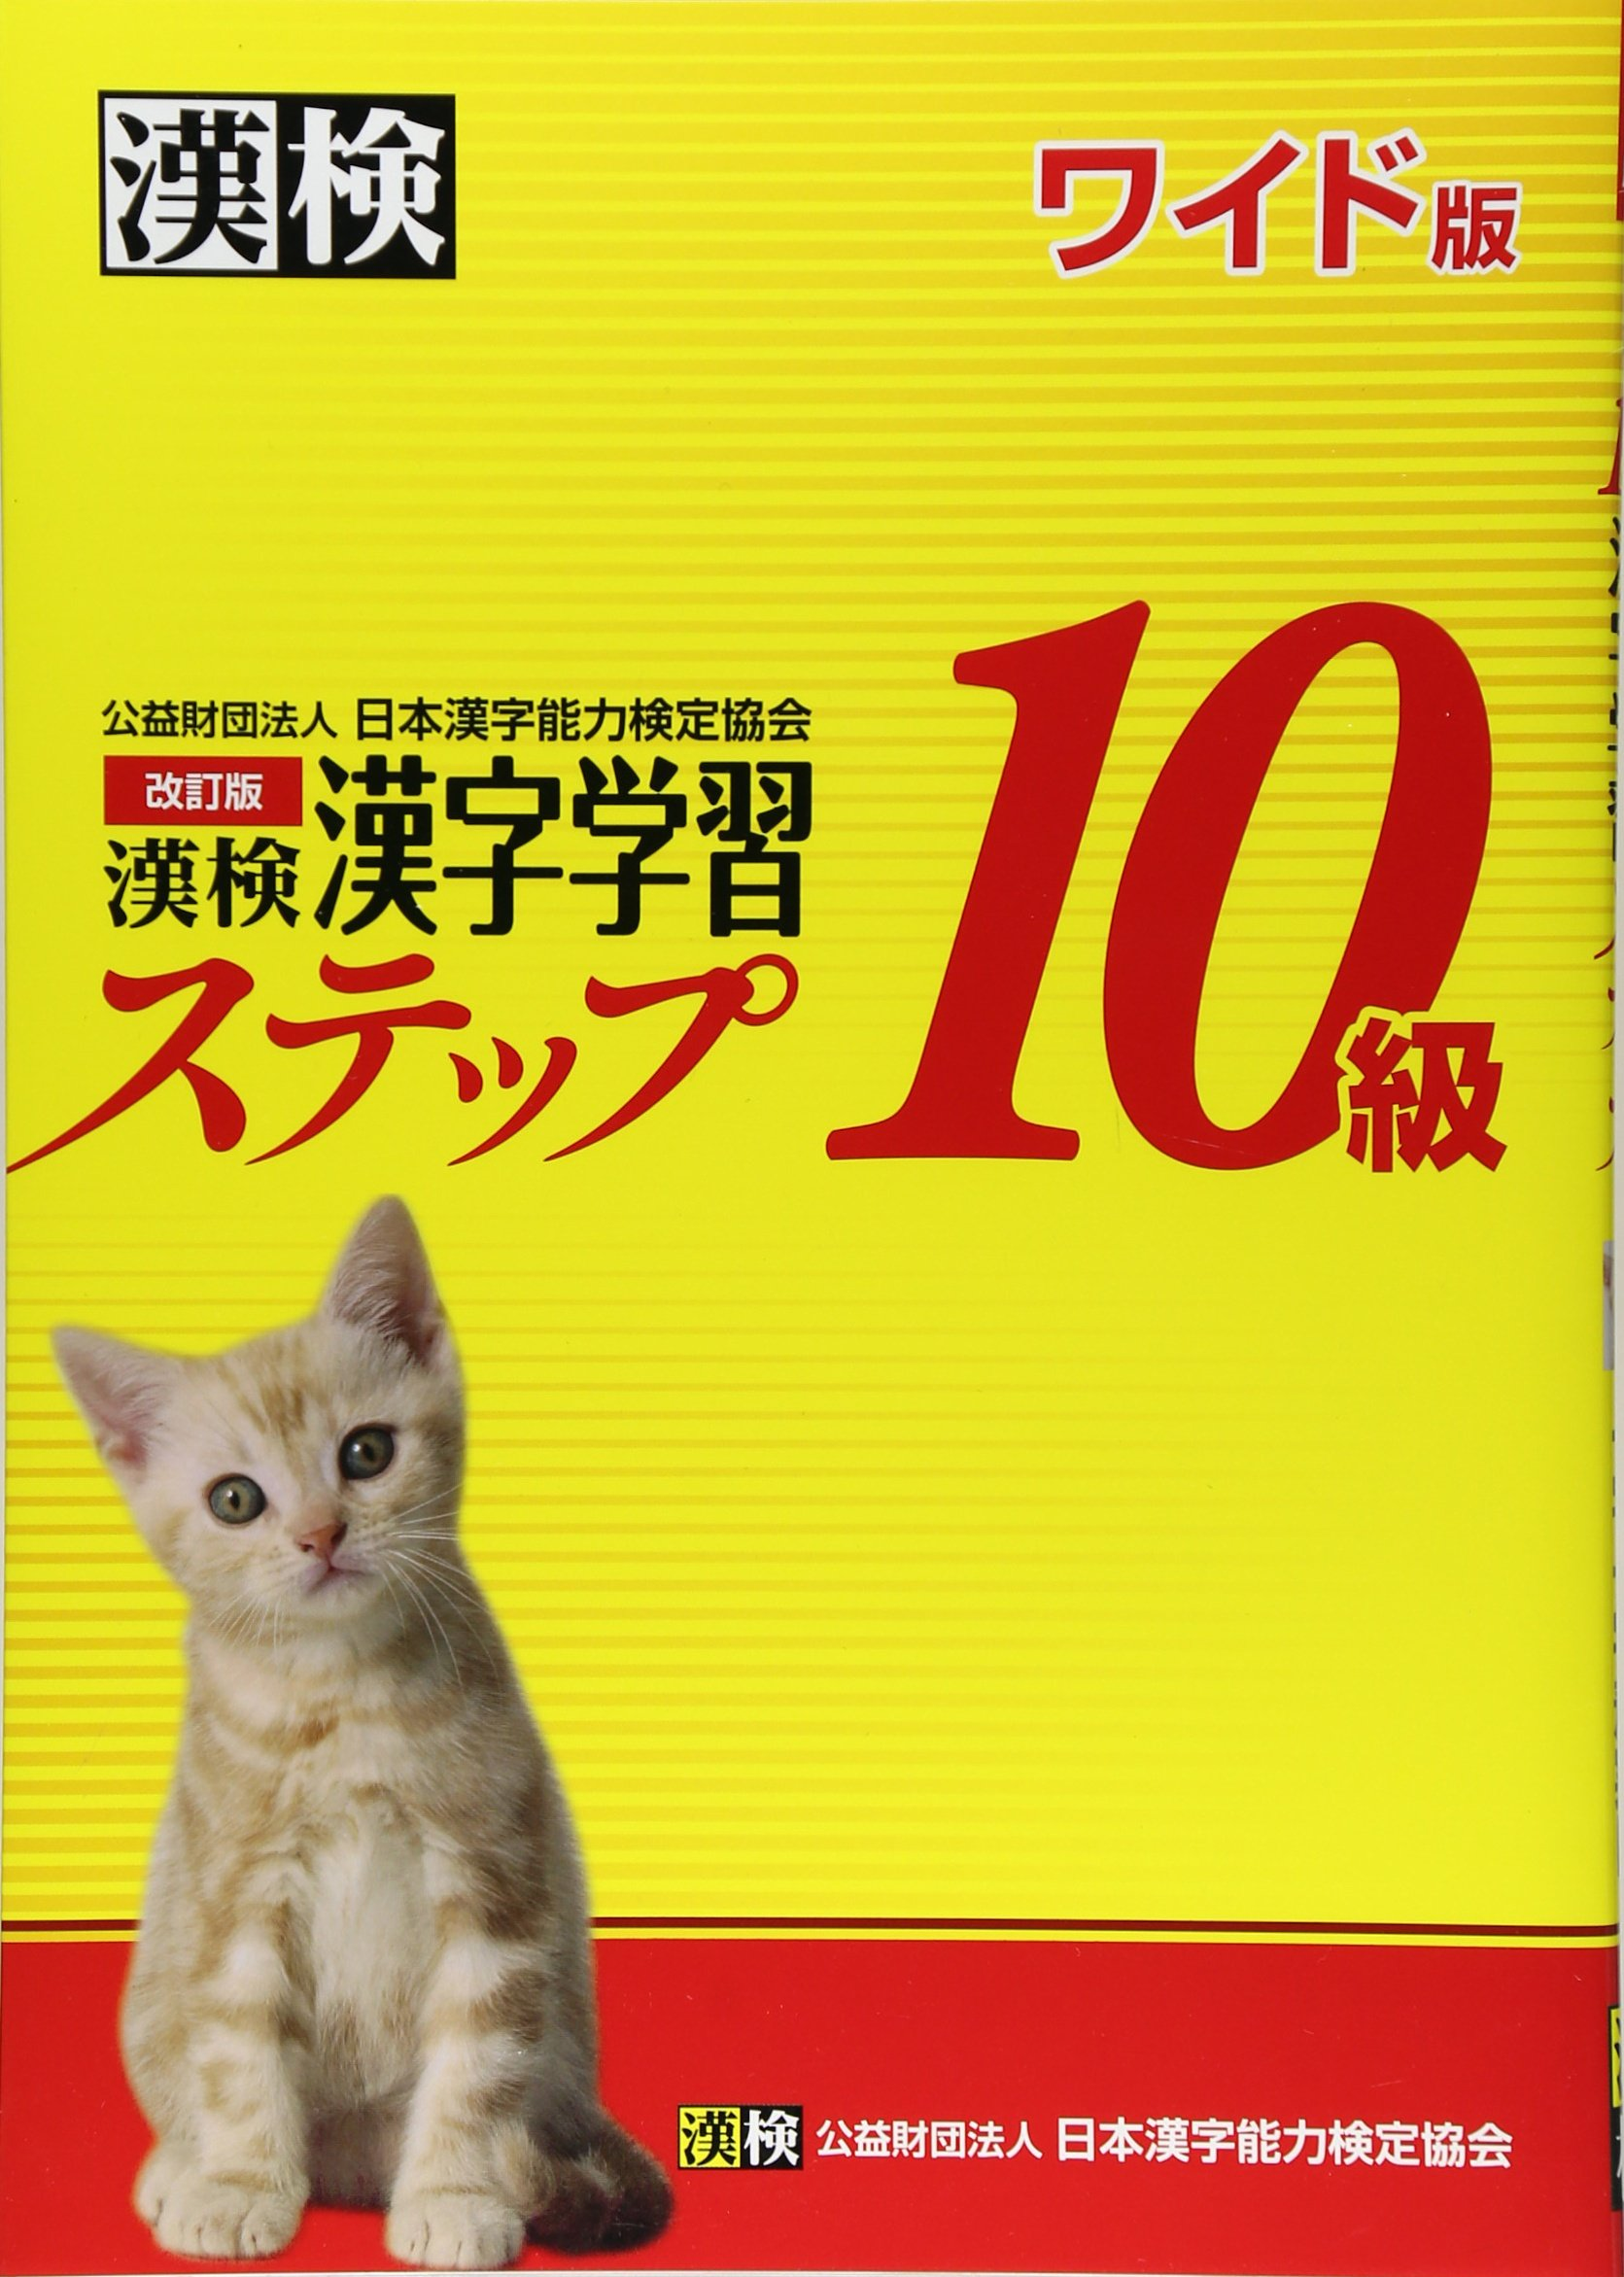 Kanken Class 10 - Kanji Learning Step Revision - Wide version pdf